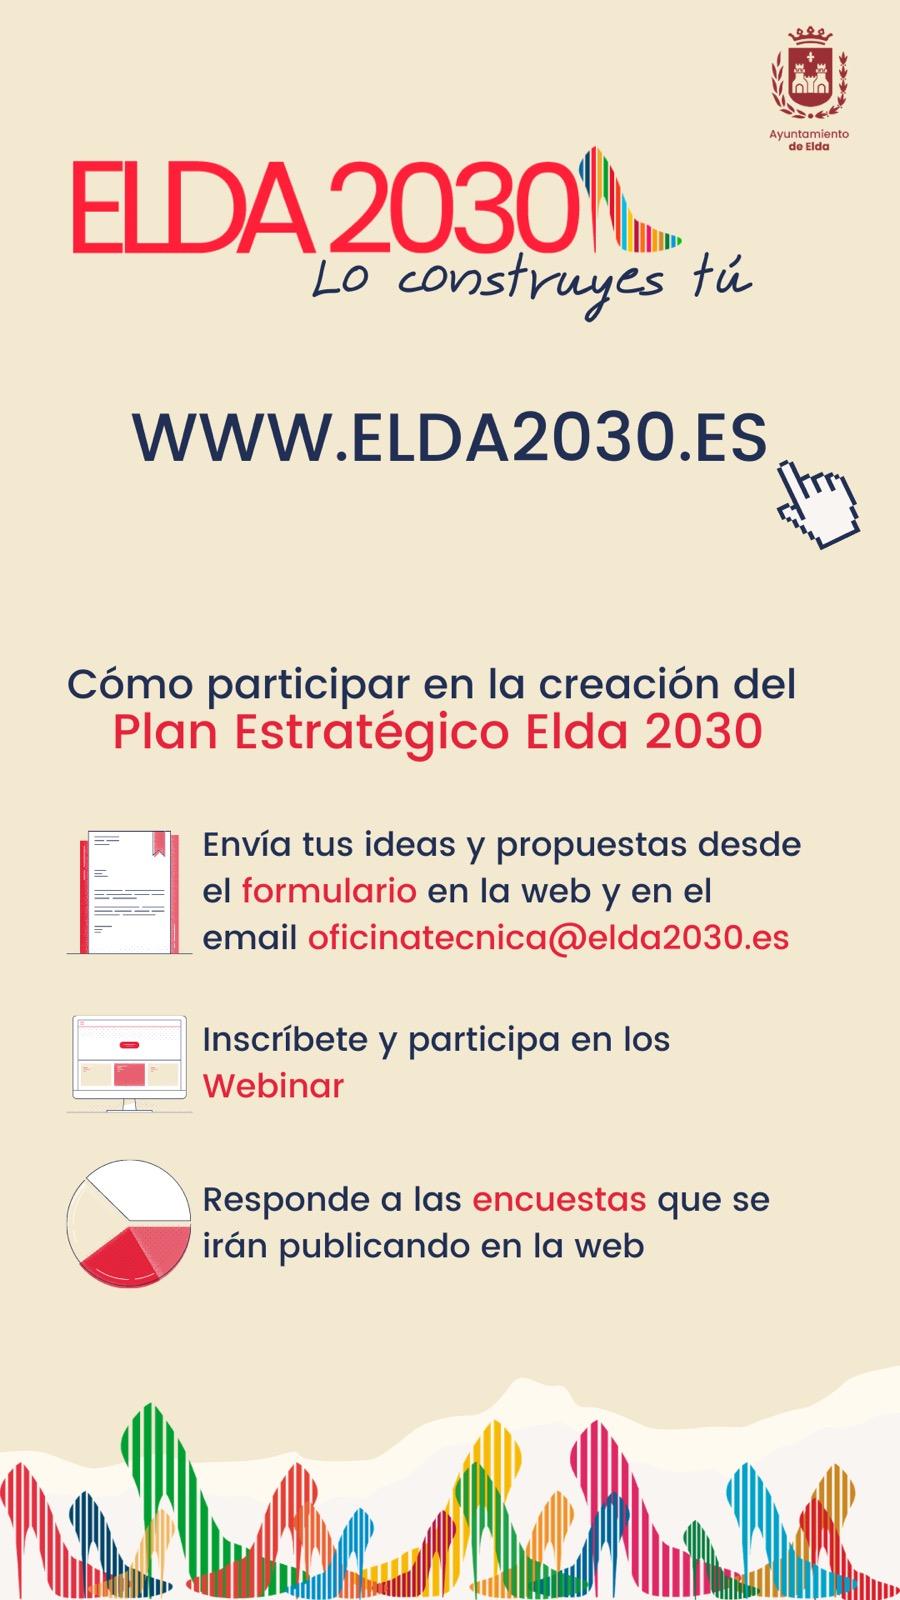 Logo Elda 2030